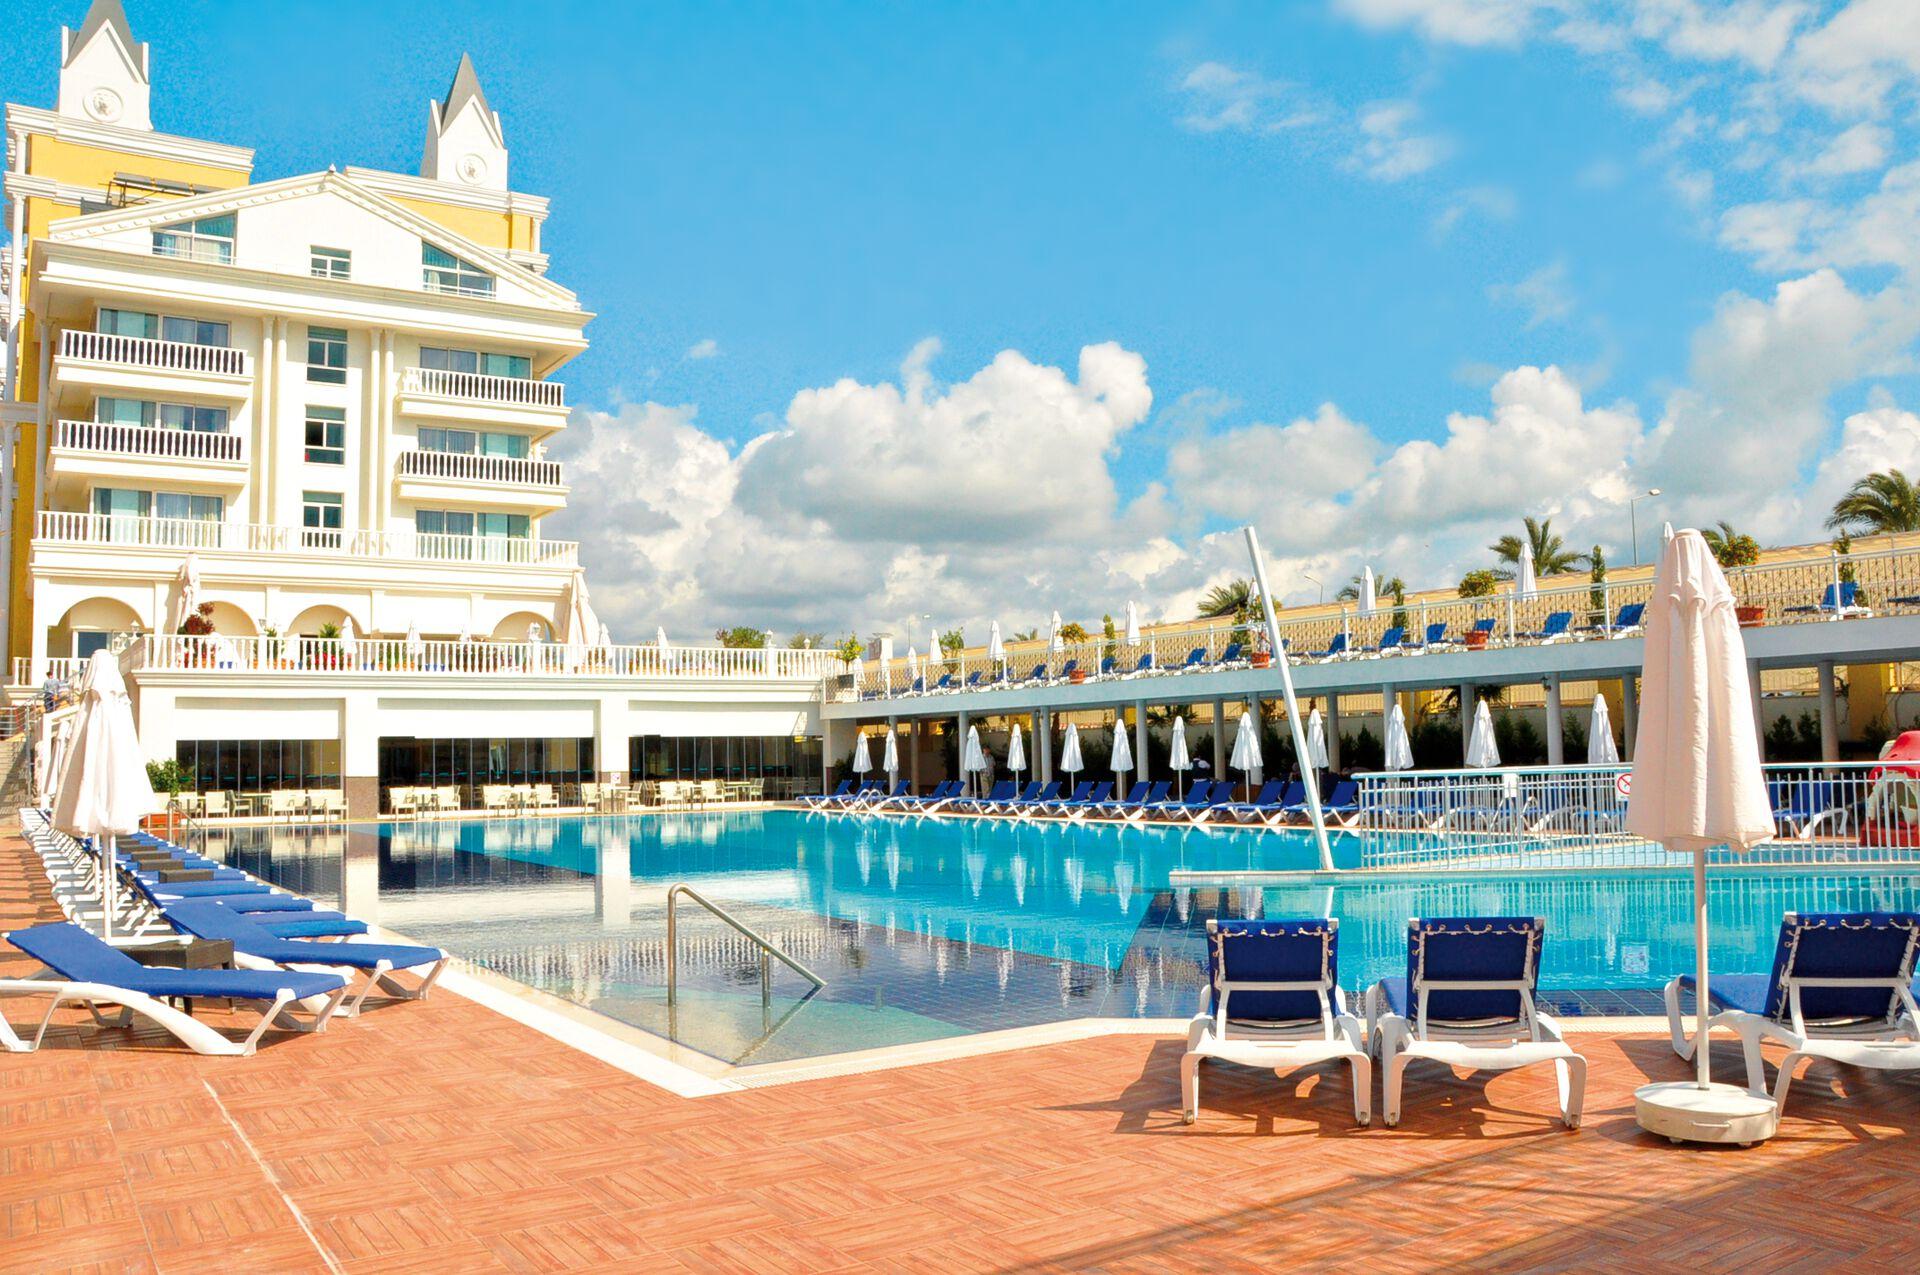 Séjour Turquie - Dream World Resort & Spa - 5*